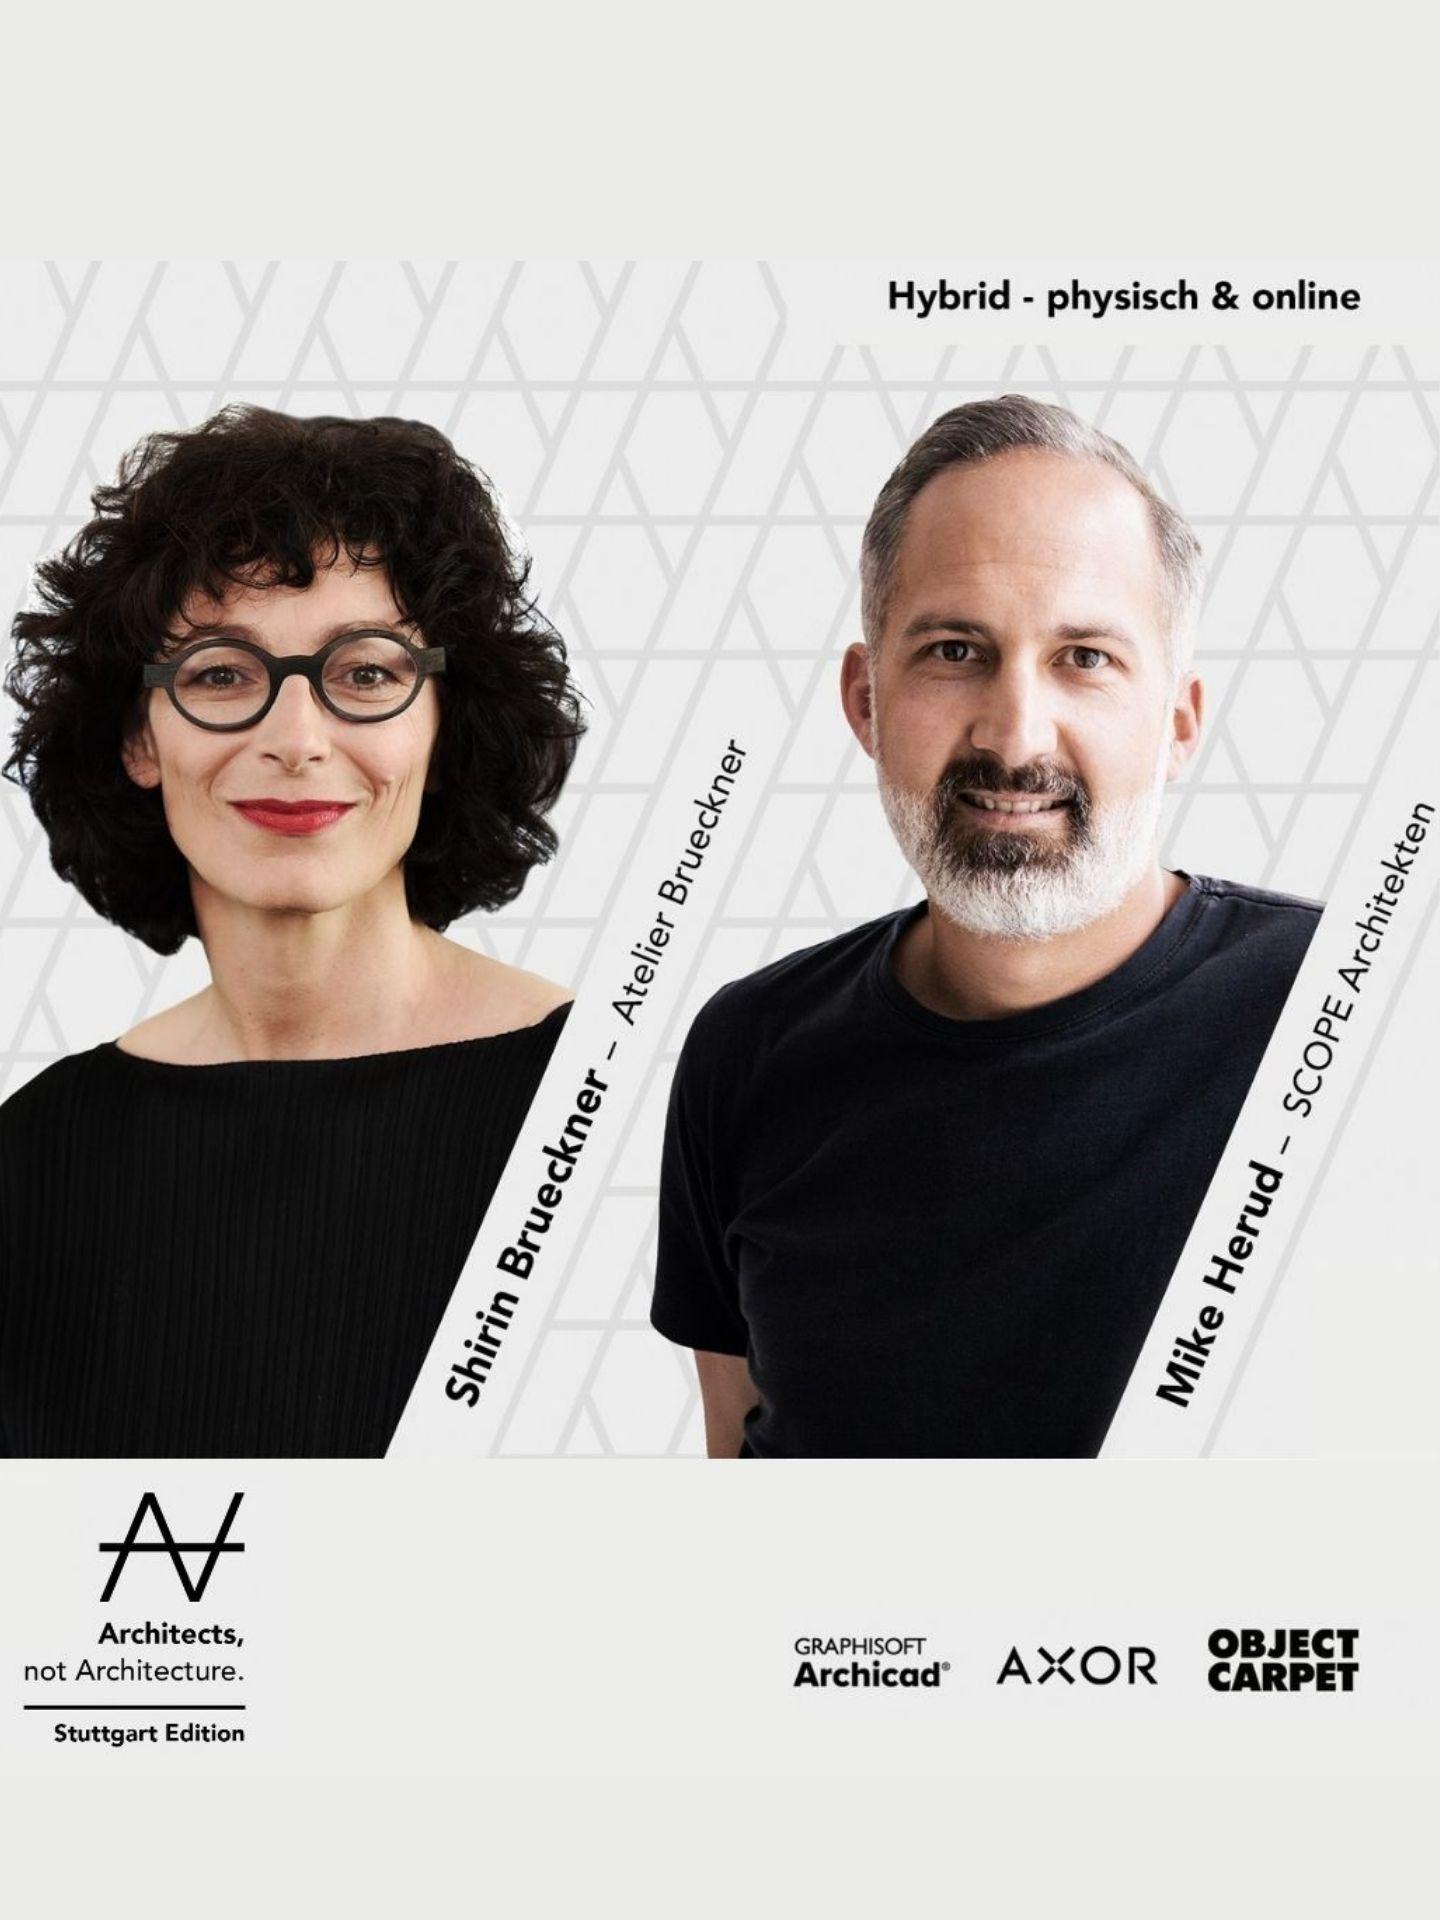 Stuttgart Edition - Architects, not Architecture